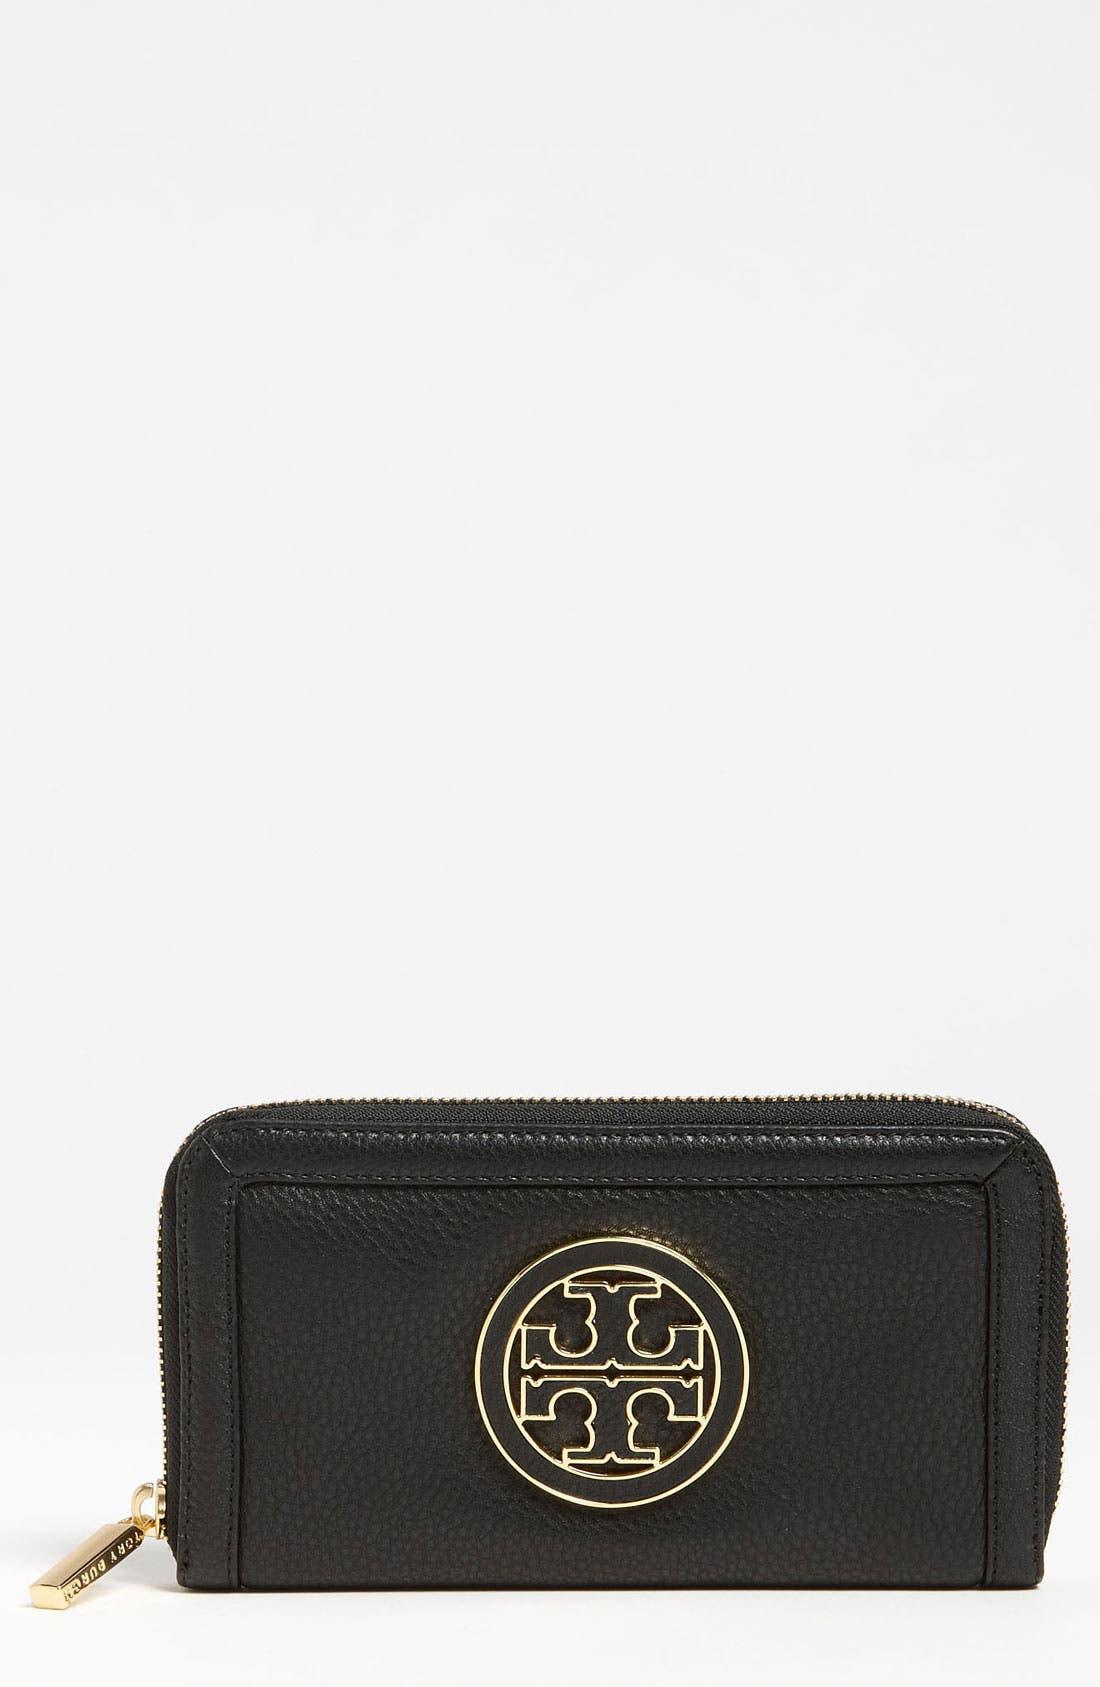 Main Image - Tory Burch 'Amanda' Continental Wallet